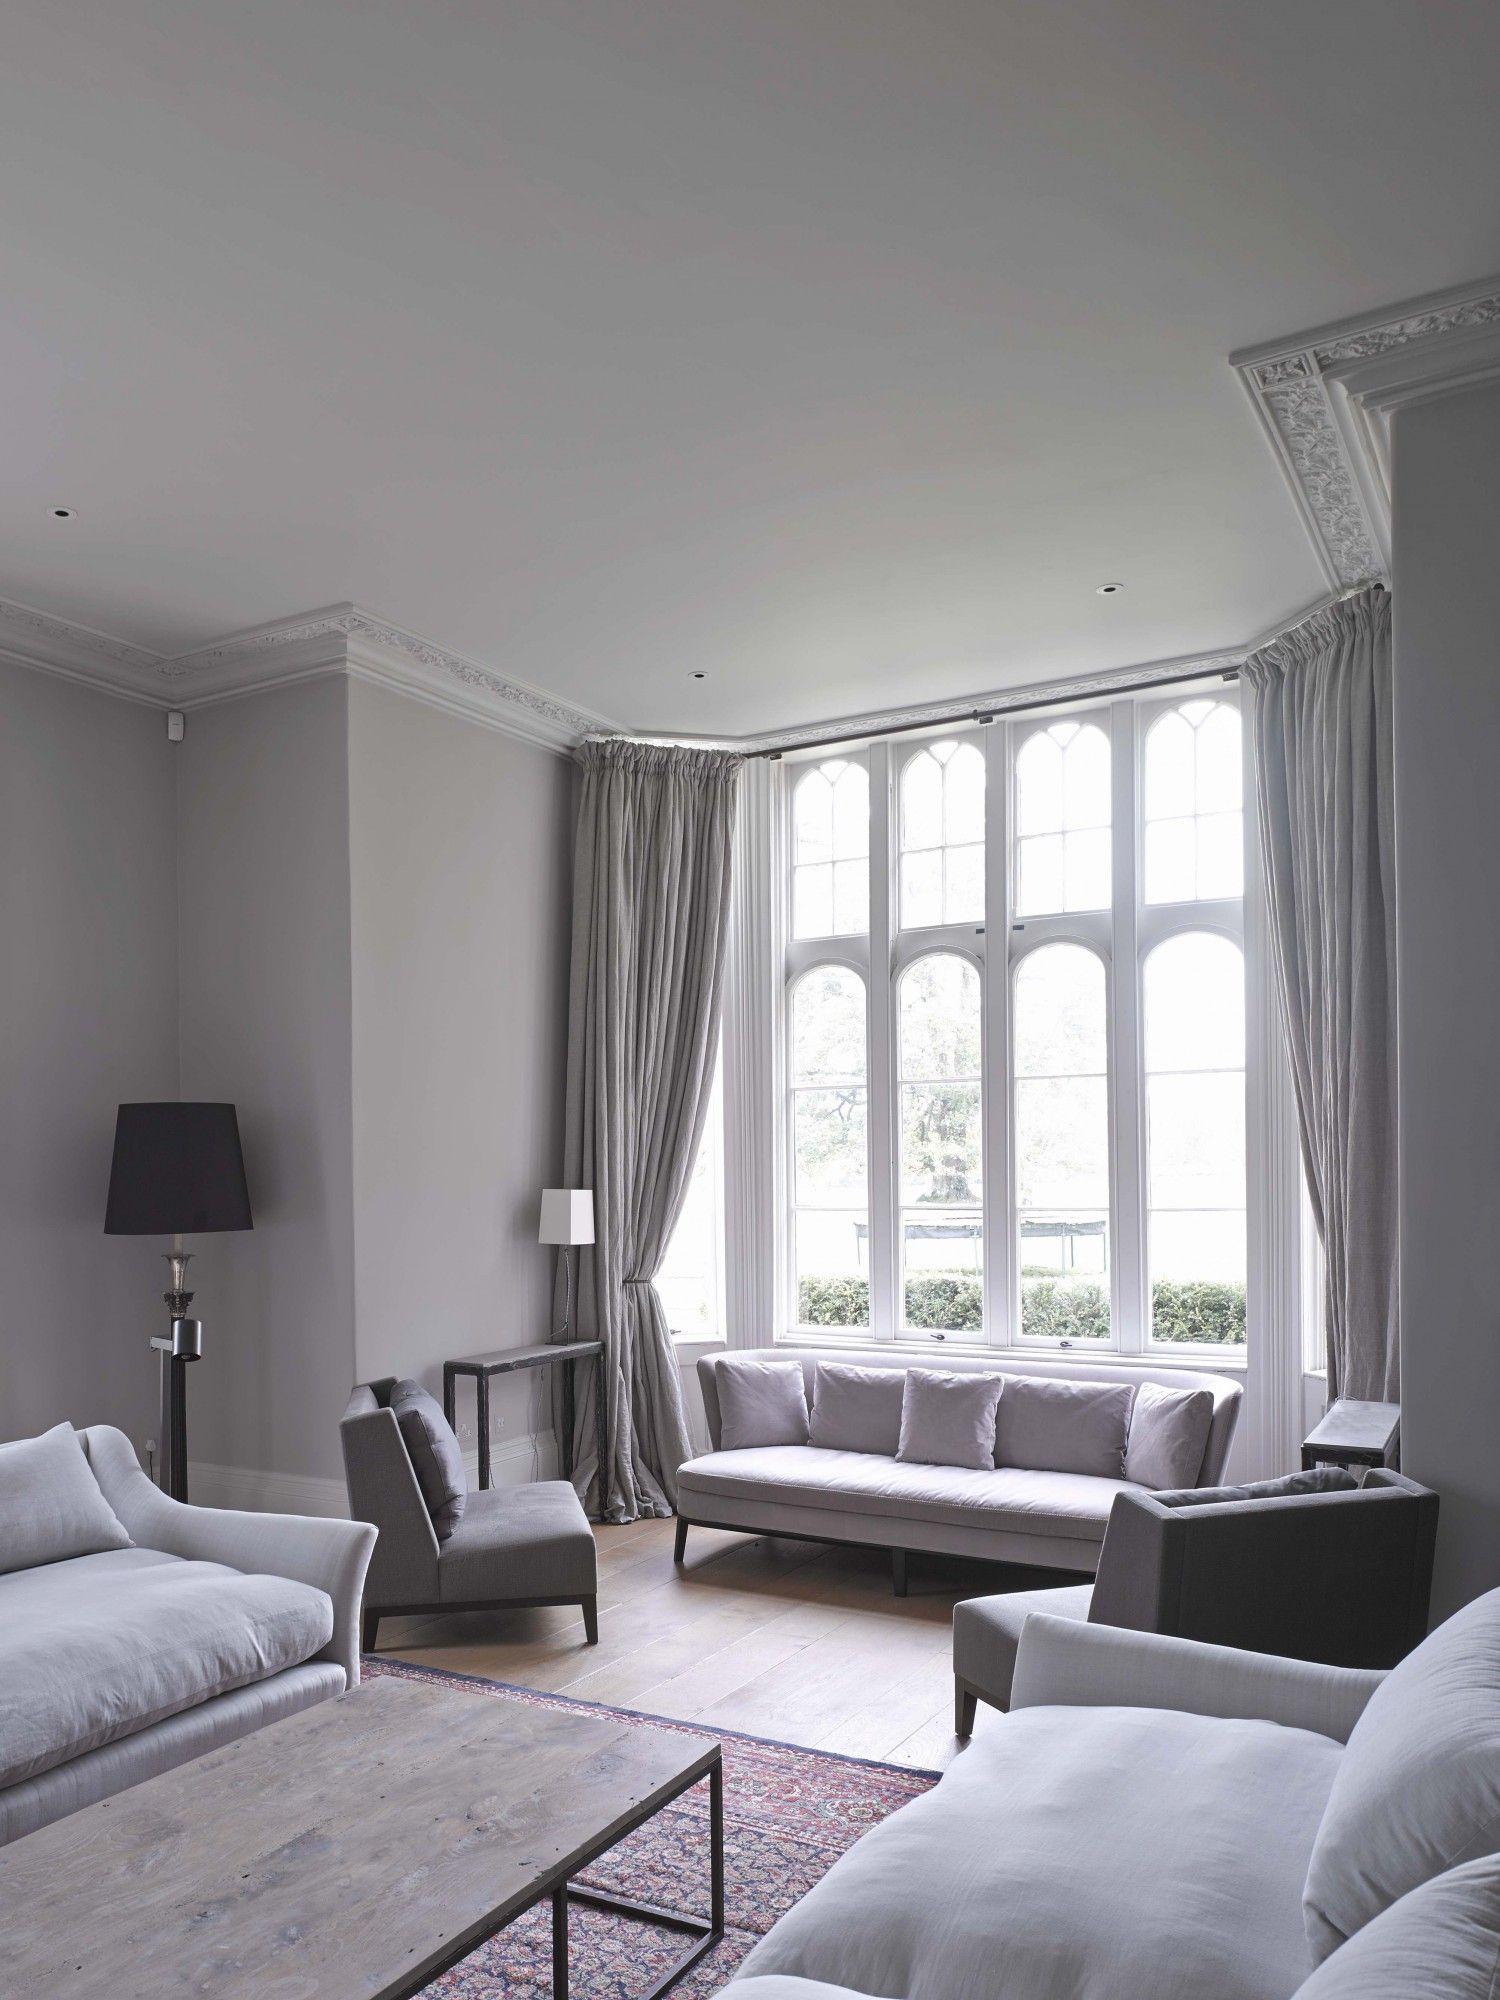 Nice Living Rooms Designs: House Inside, Interior, Living Room Sofa